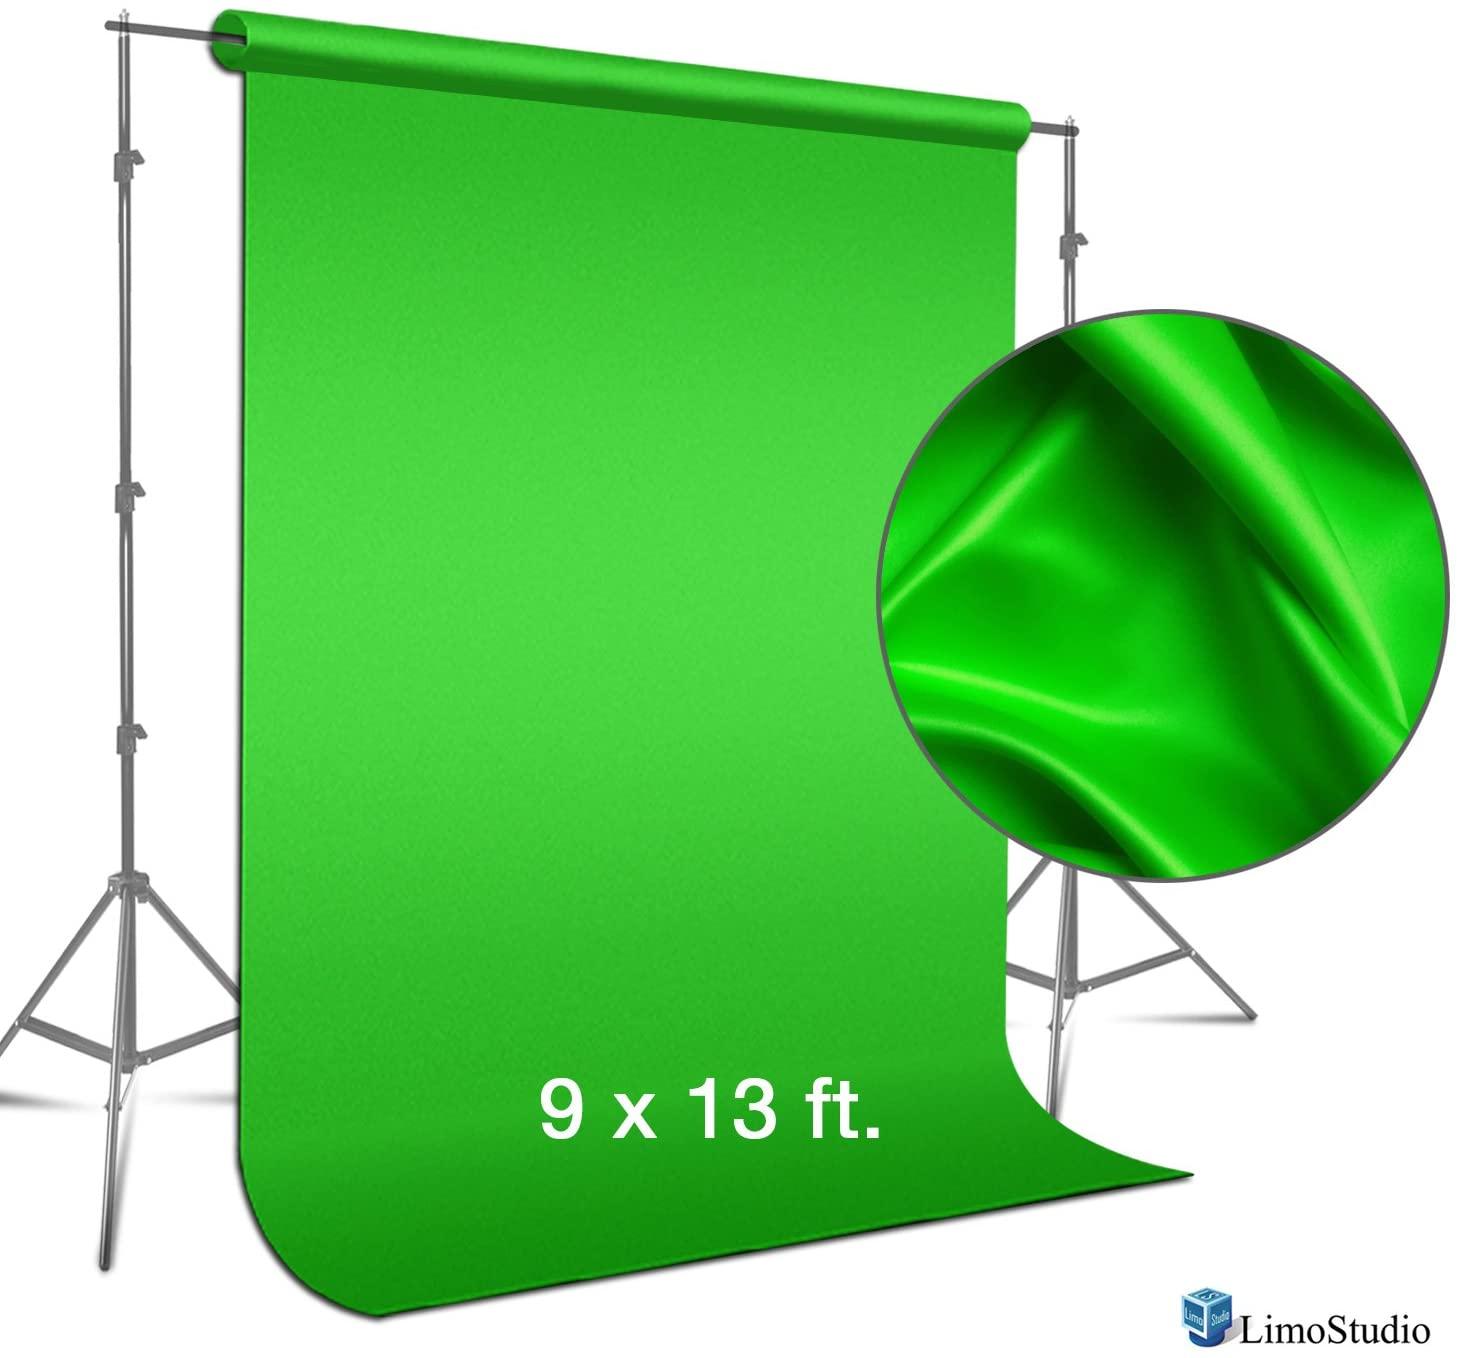 professional video setup greenscreen